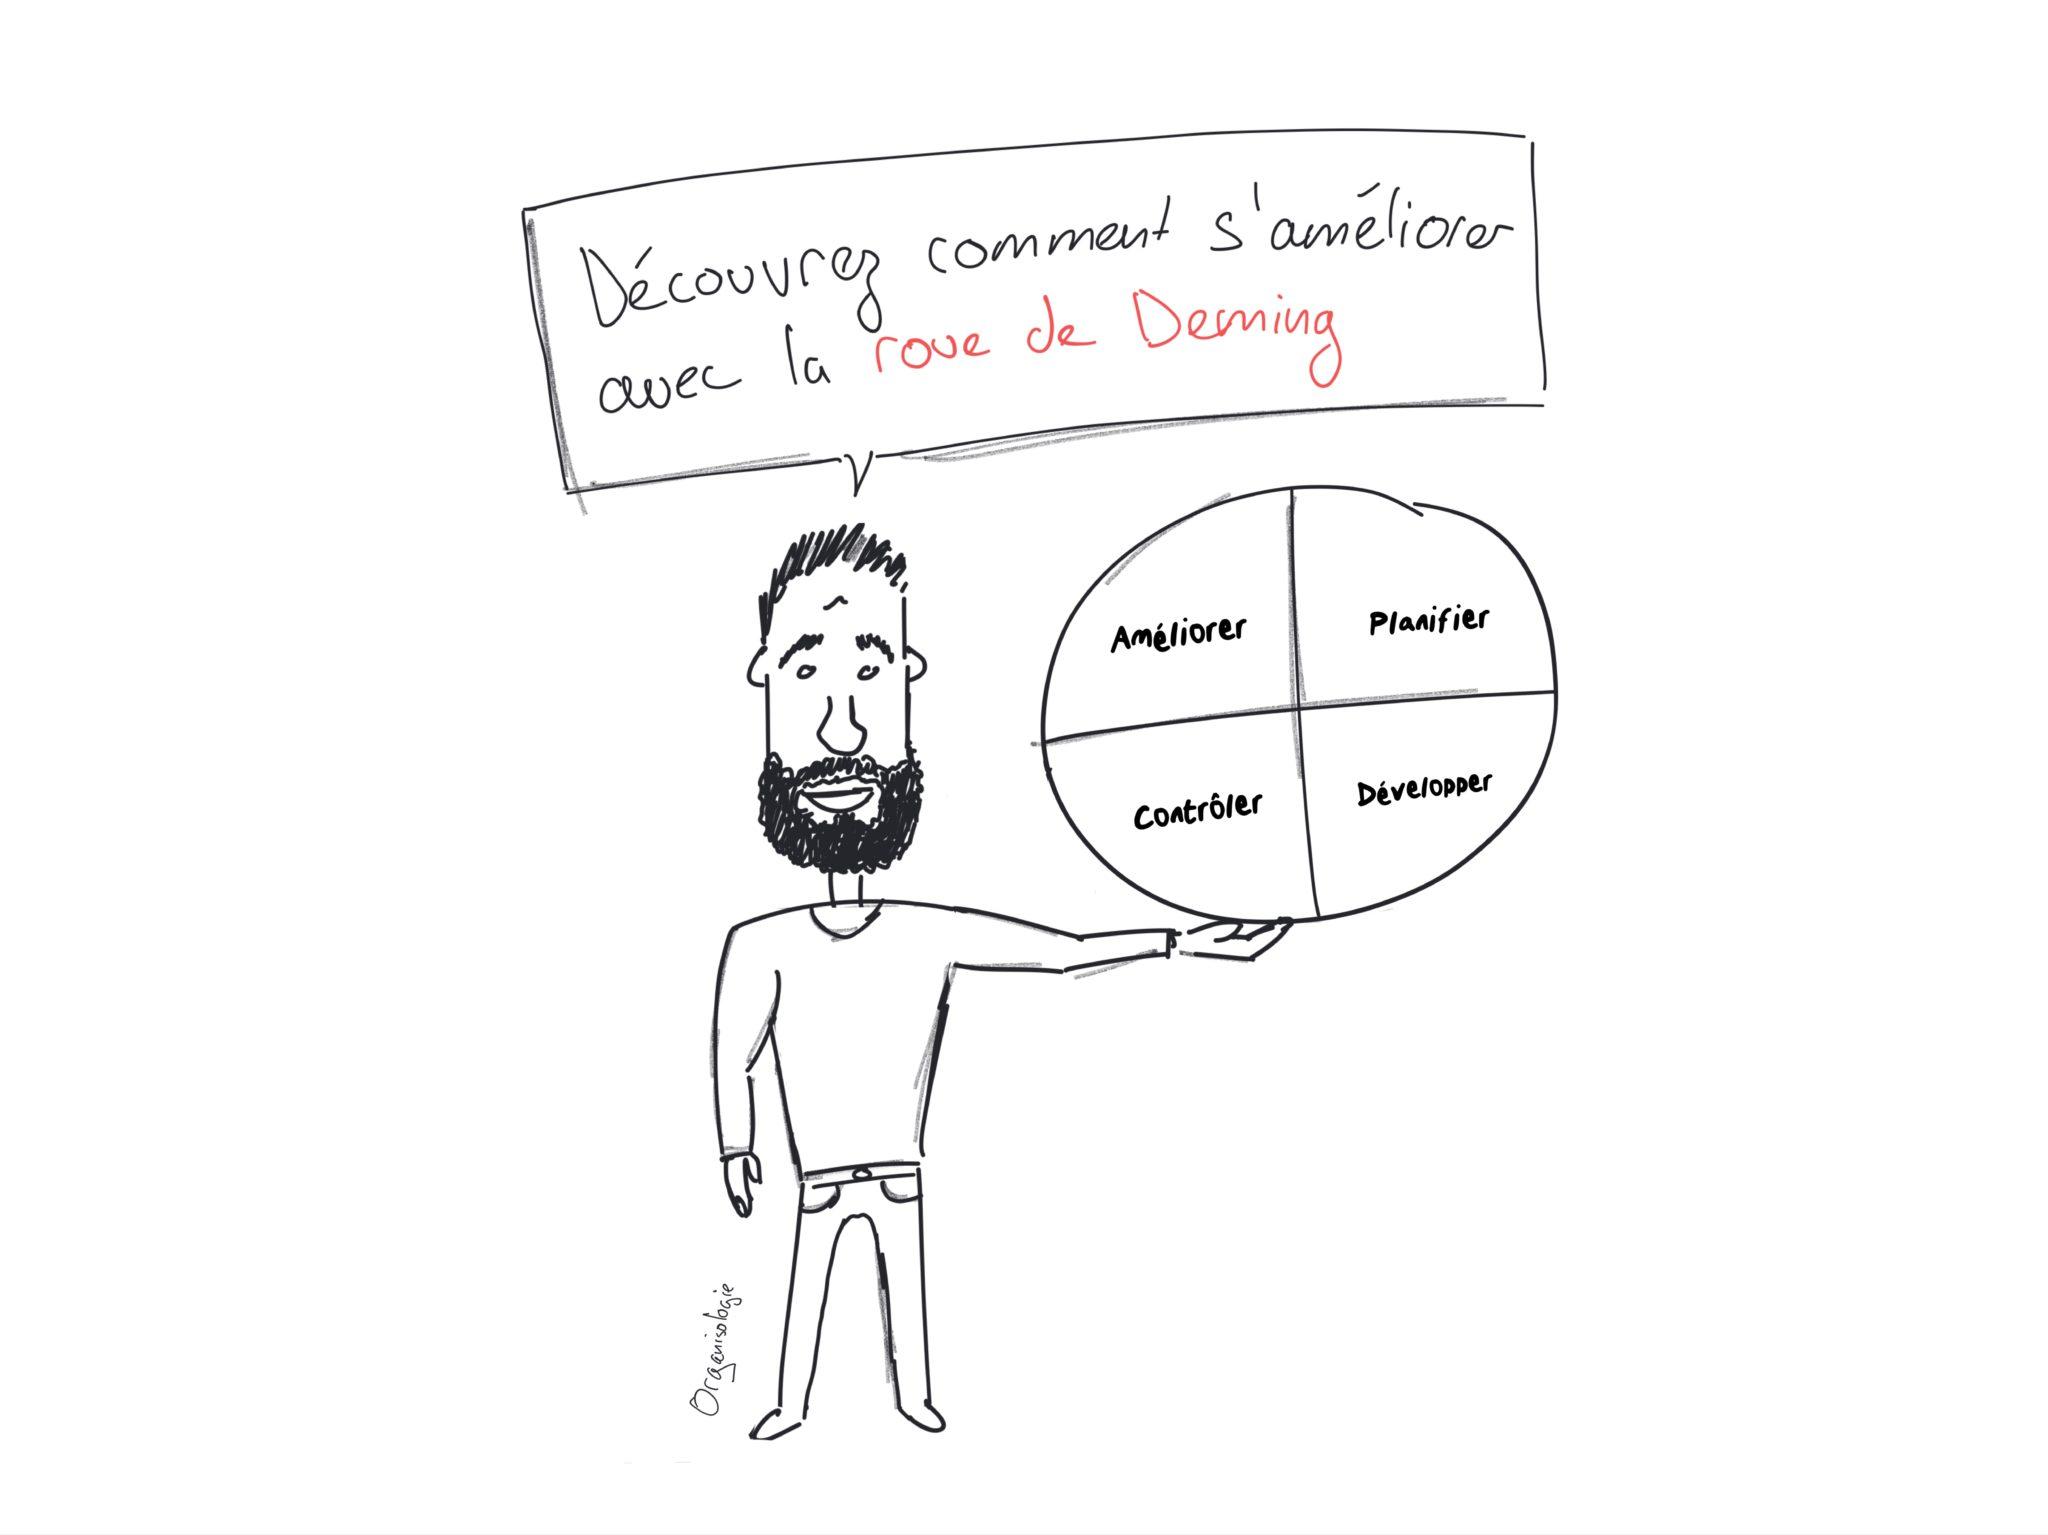 Roue de deming : méthode pdca